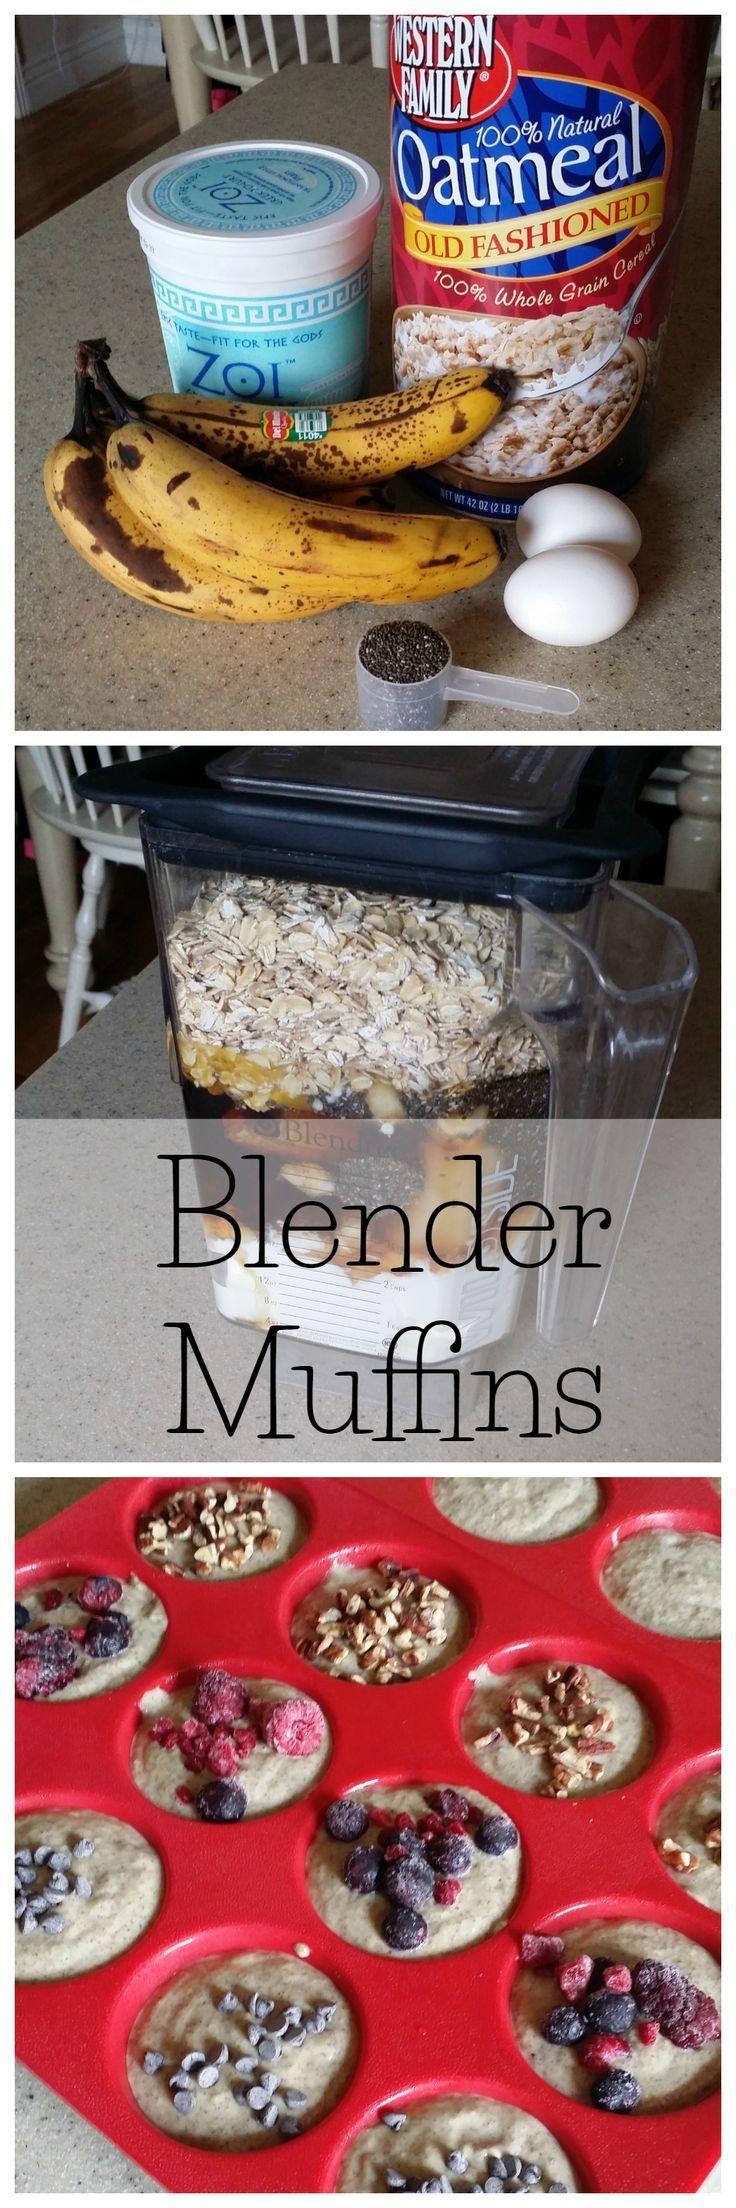 Blender Muffins. Super easy recipe!